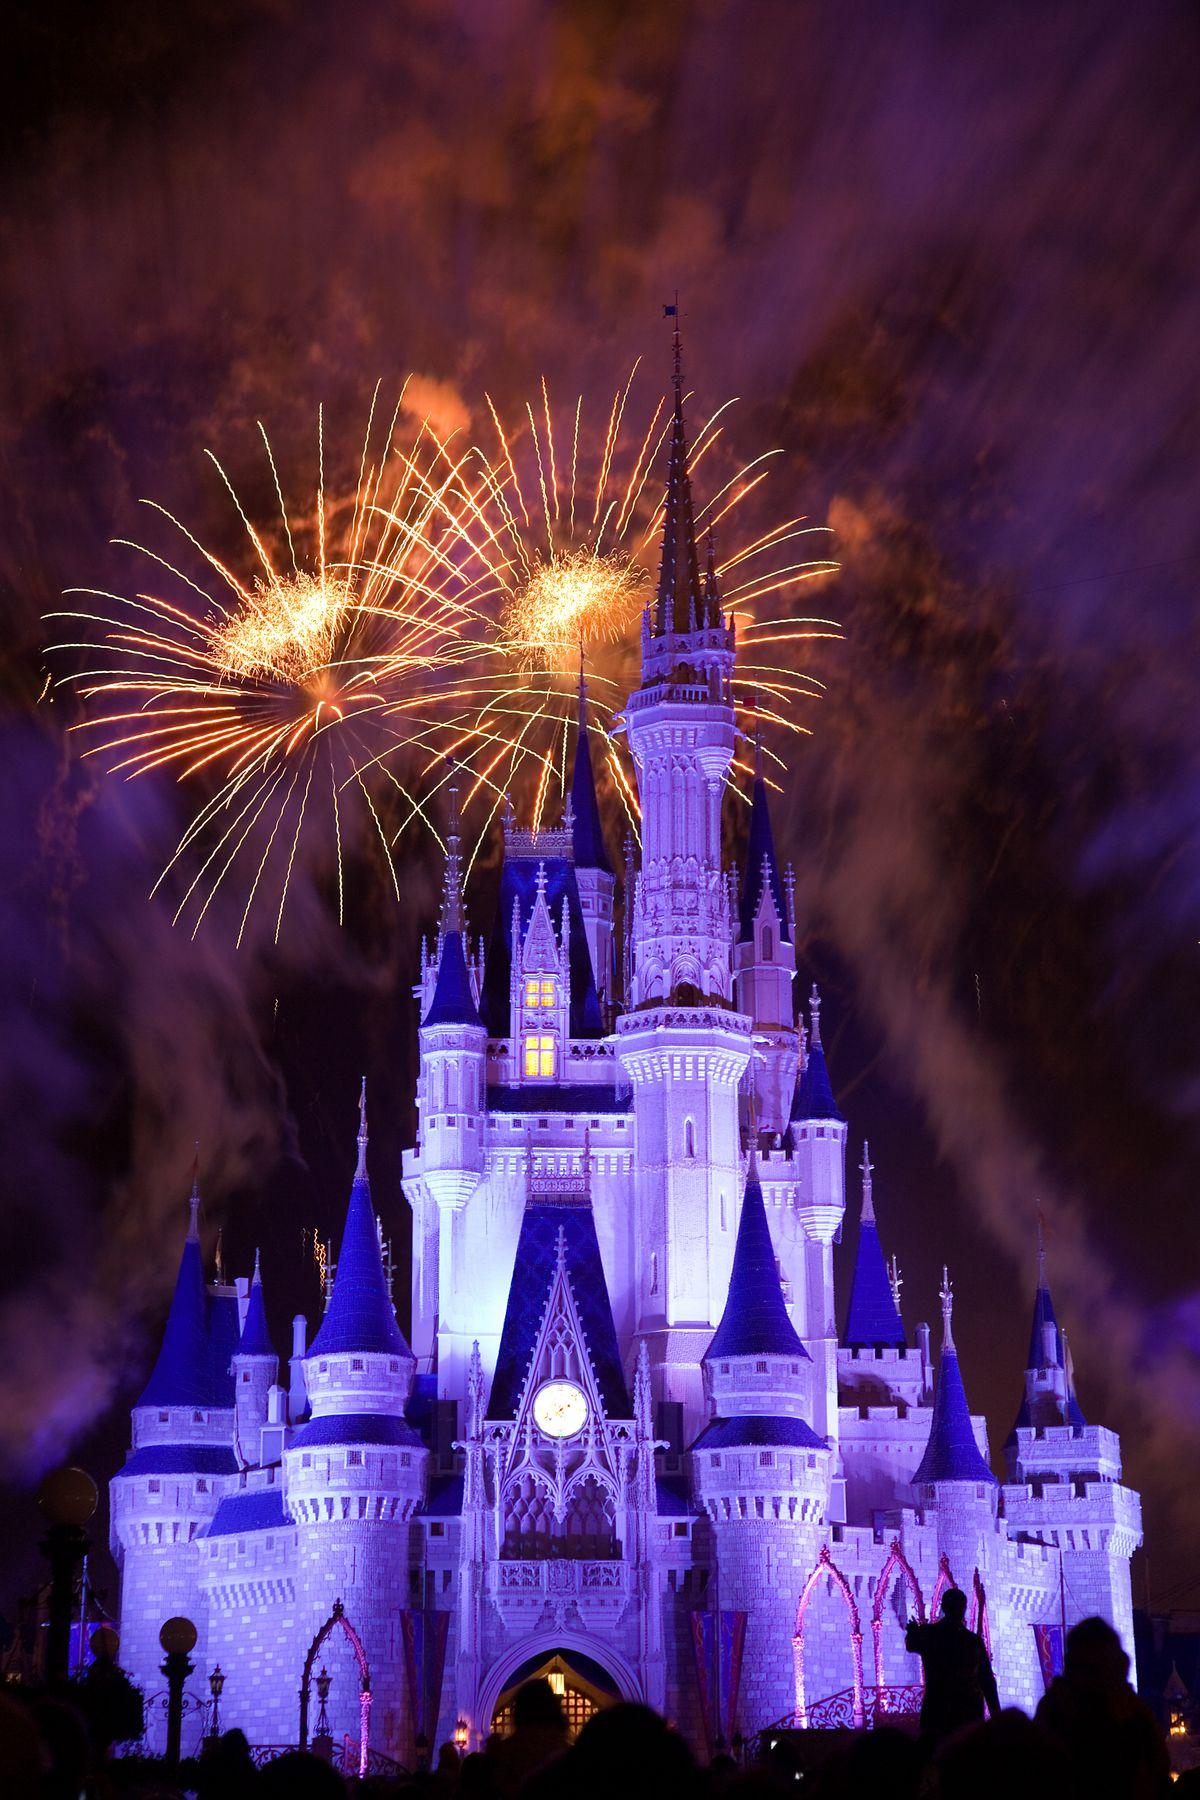 7 Things Disney Taught Me